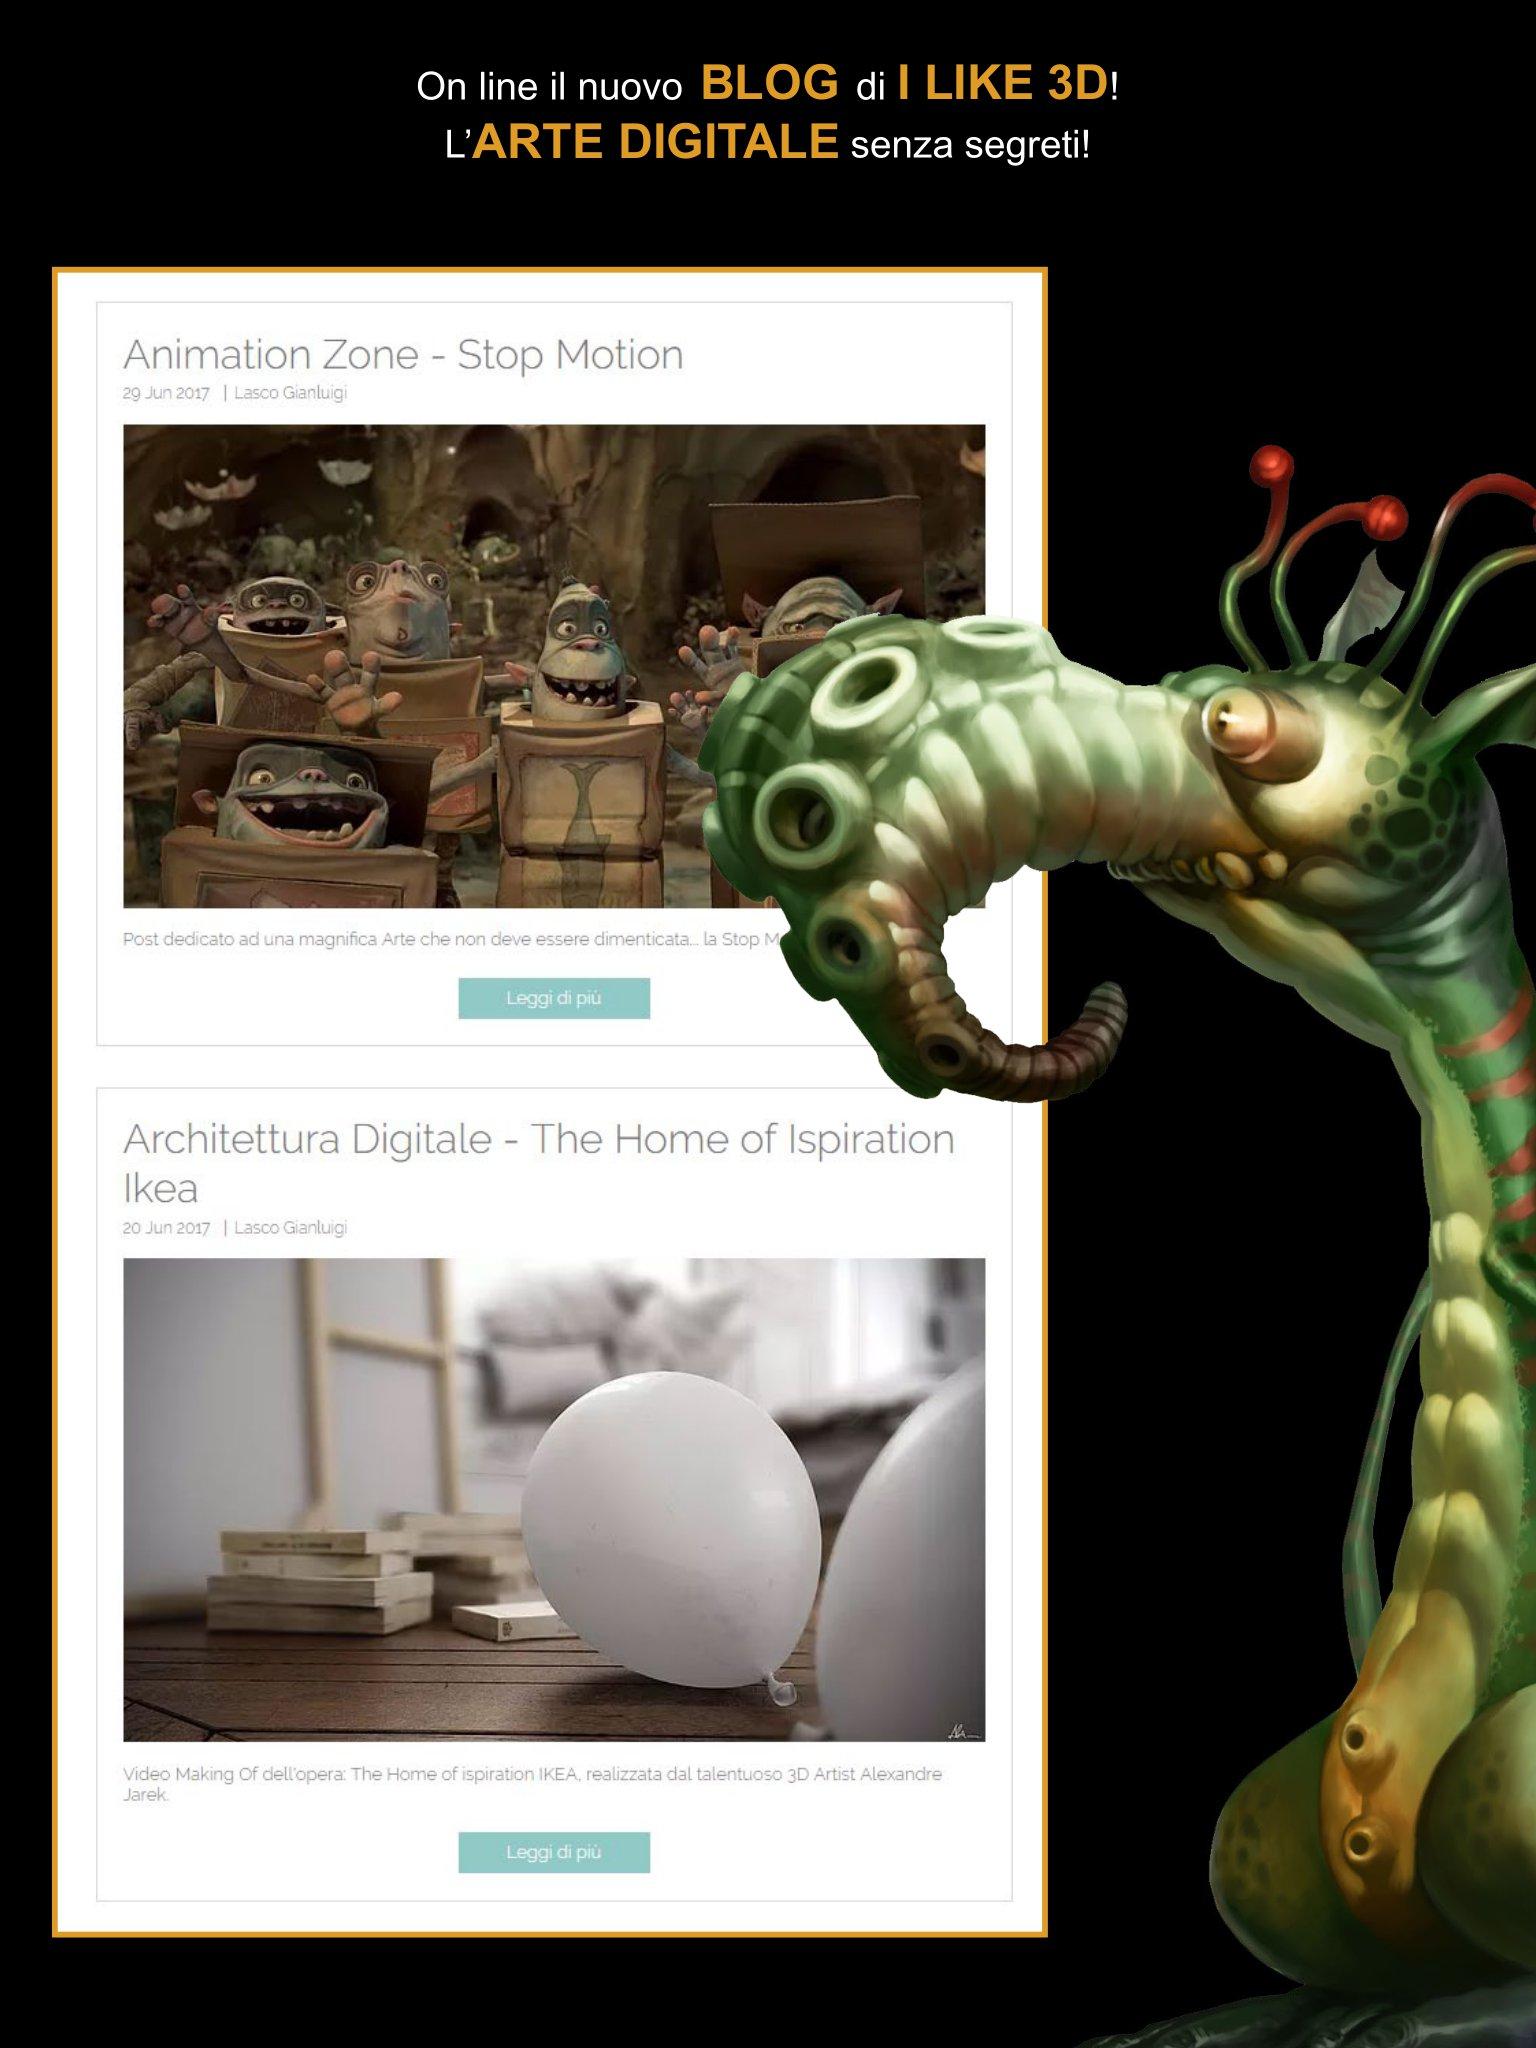 Blog OMAGGIO - I Like 3D #16